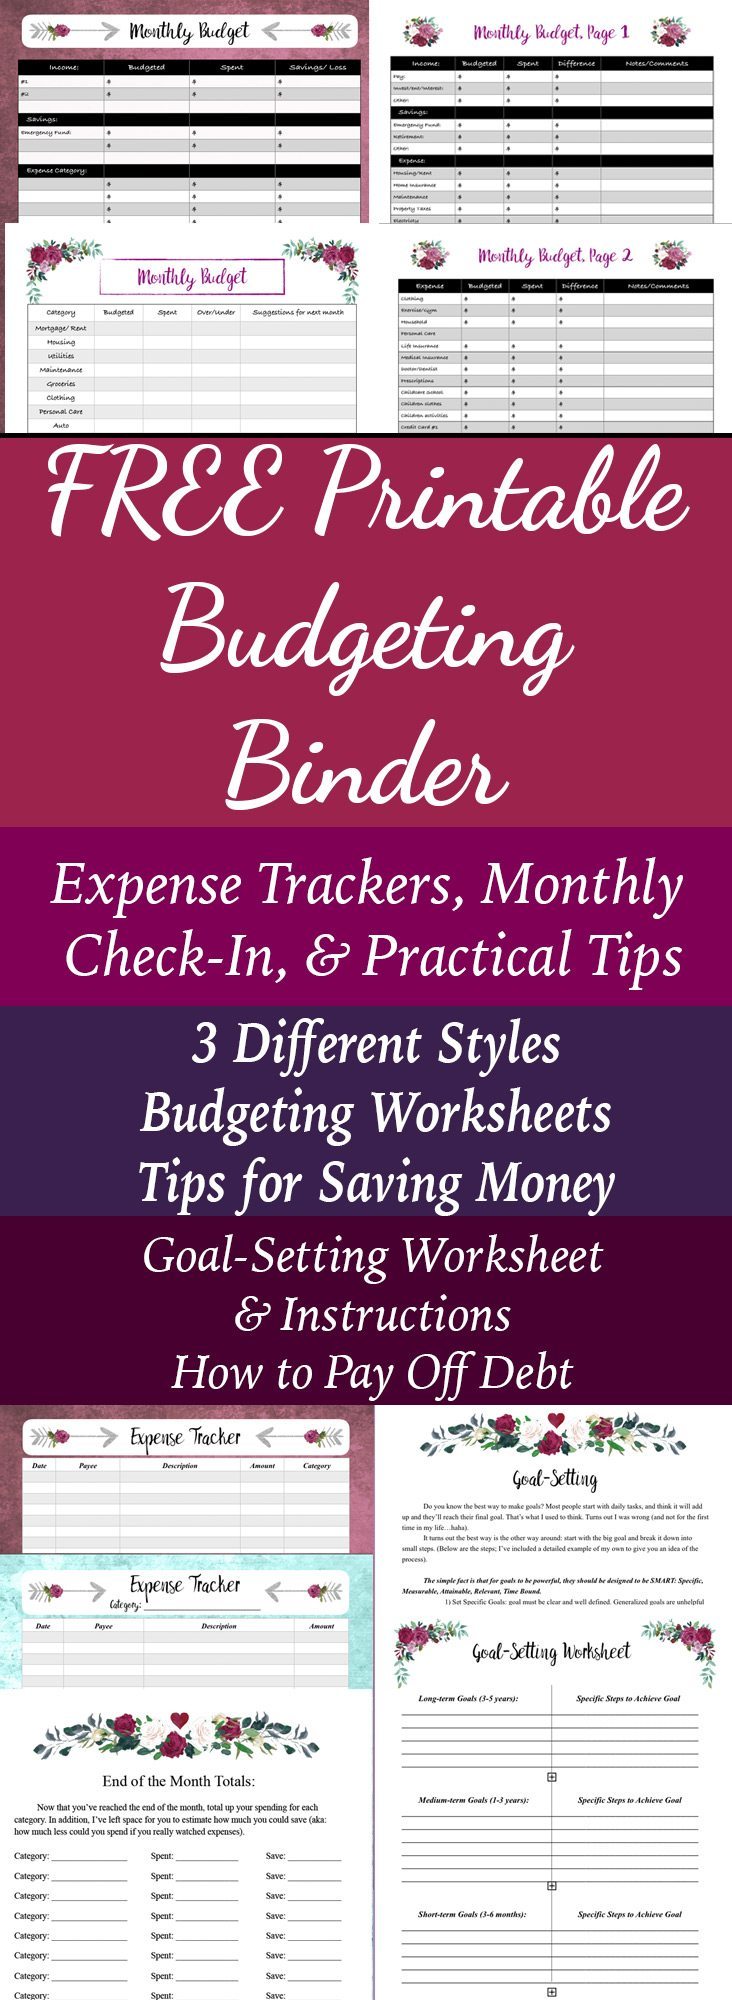 Free Printable Budgeting Binder: 15+ Pages!